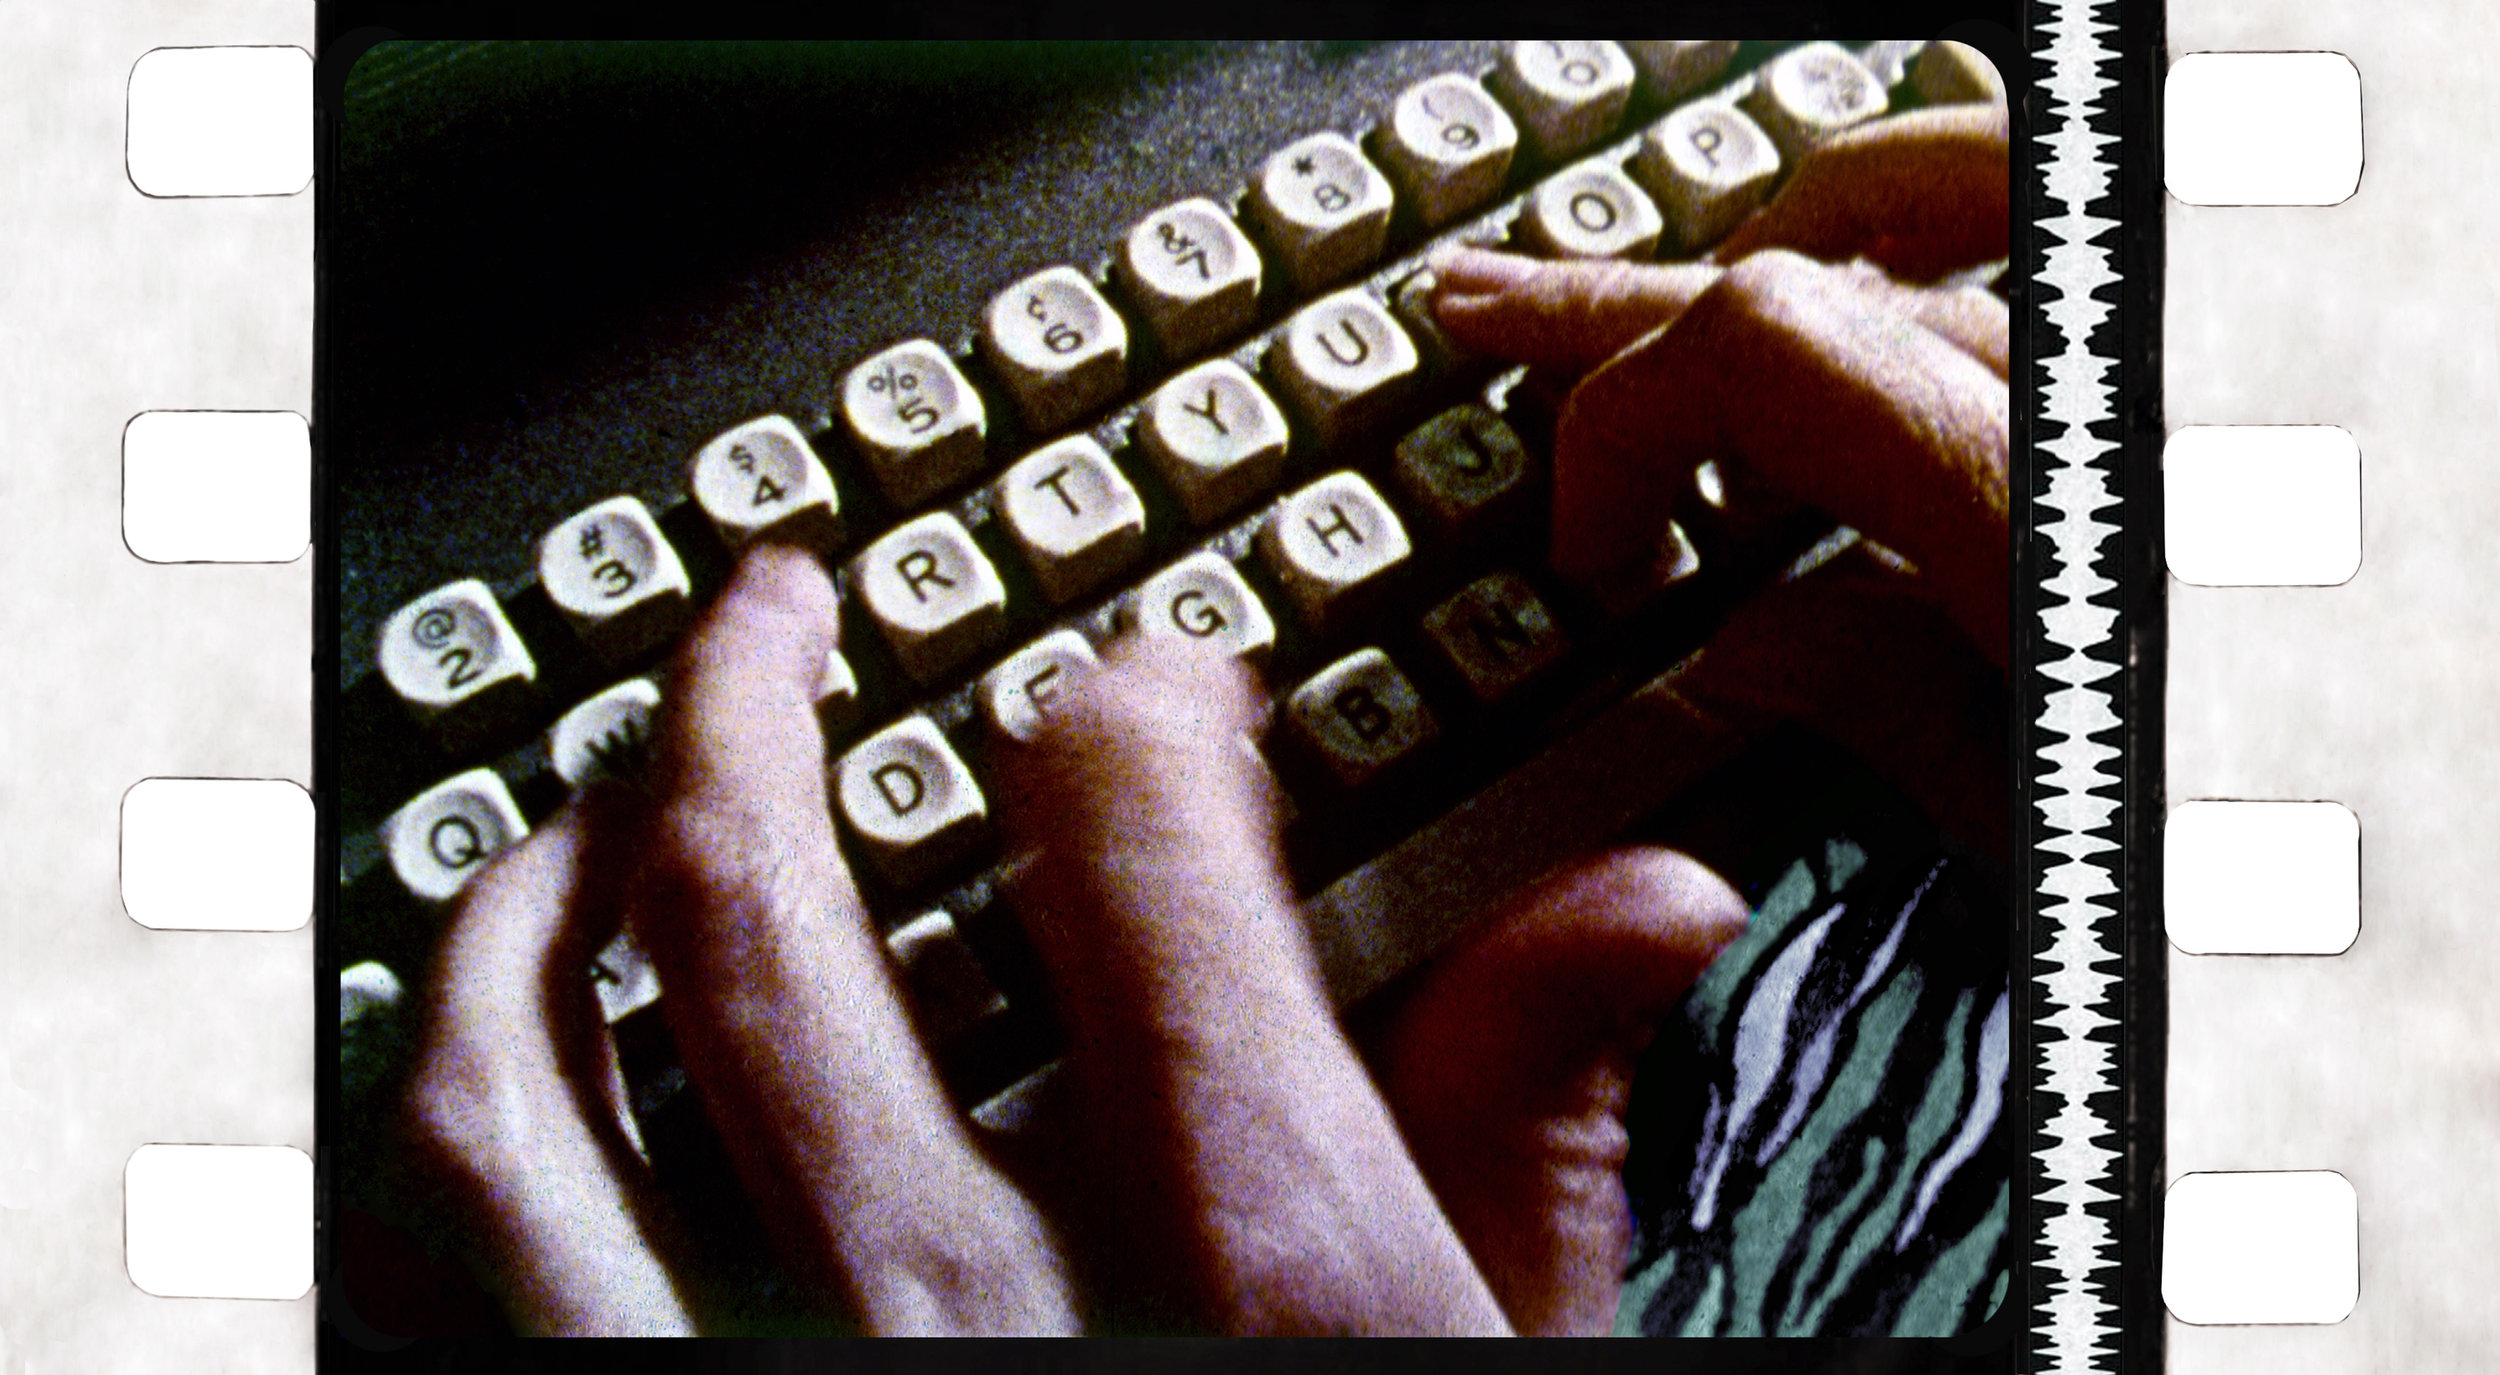 5Cinephilia typewriter.jpg